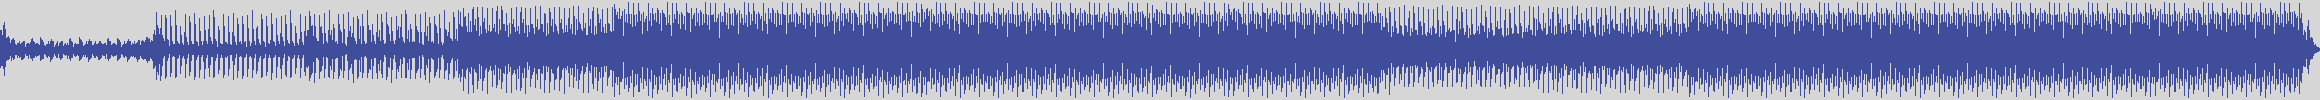 workin [WRK008] House Group - Aquaspeed [Club Mix] audio wave form